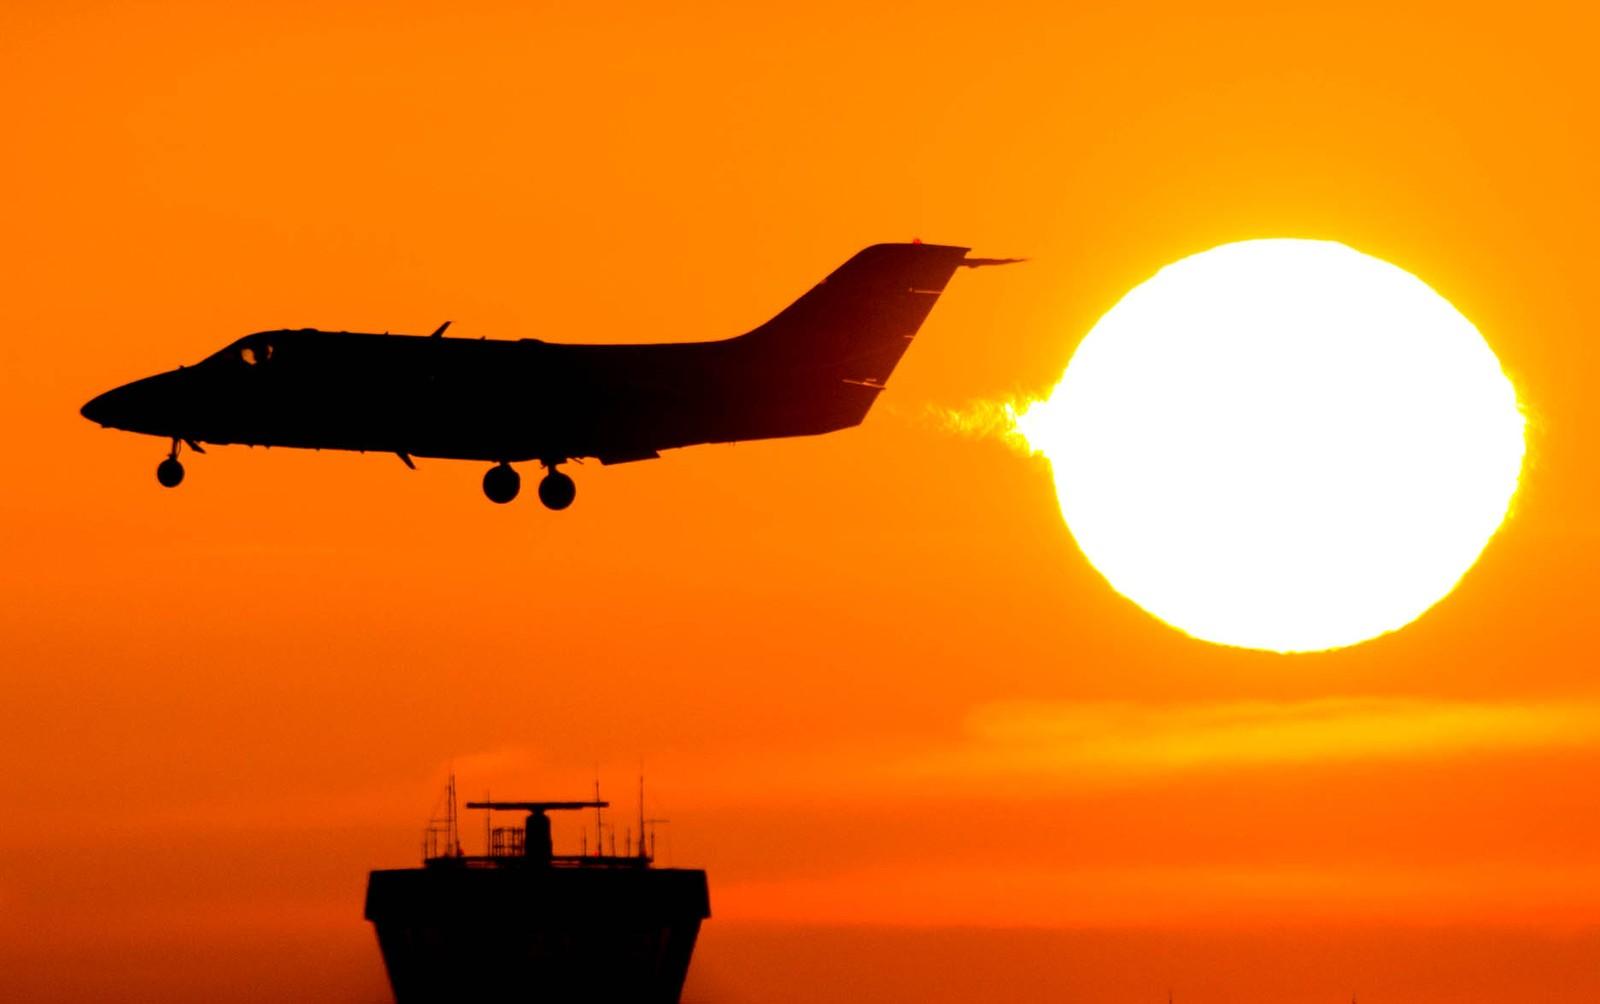 Et fly lander i Düsseldorf i Tyskland.